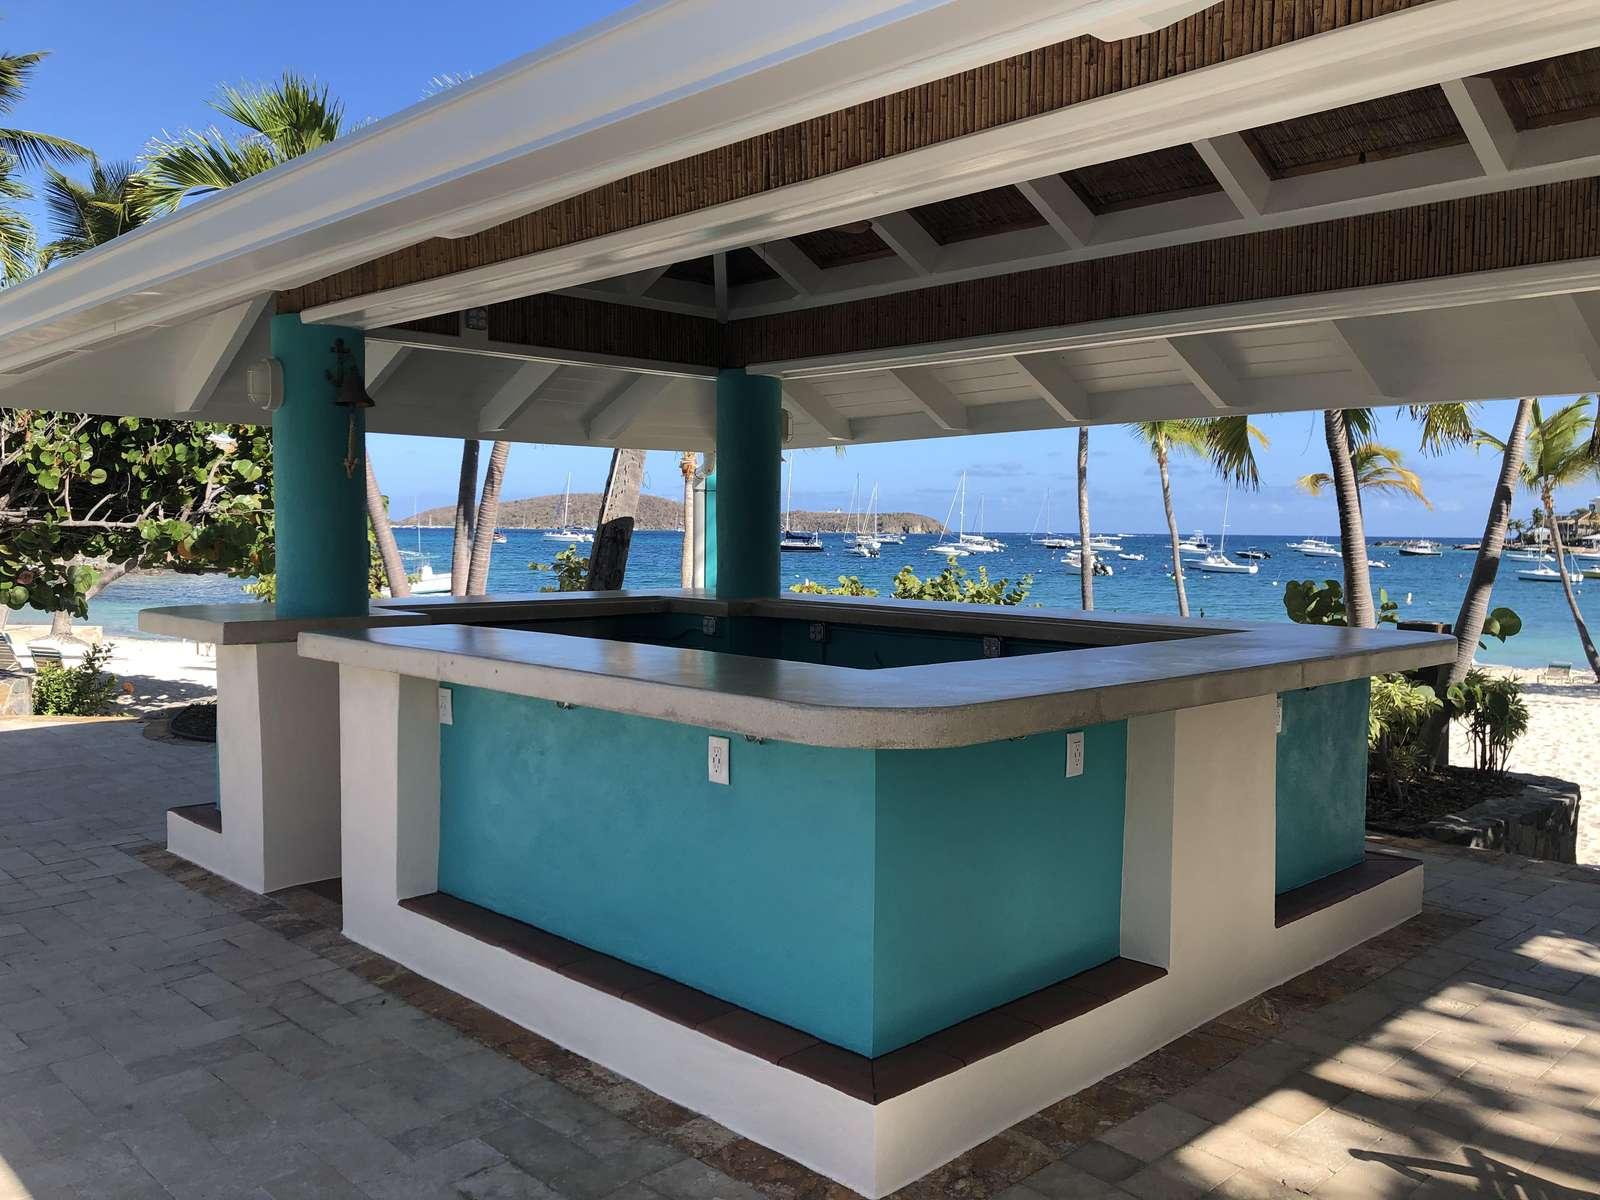 New Pool/Beach Bar, Opening 2021